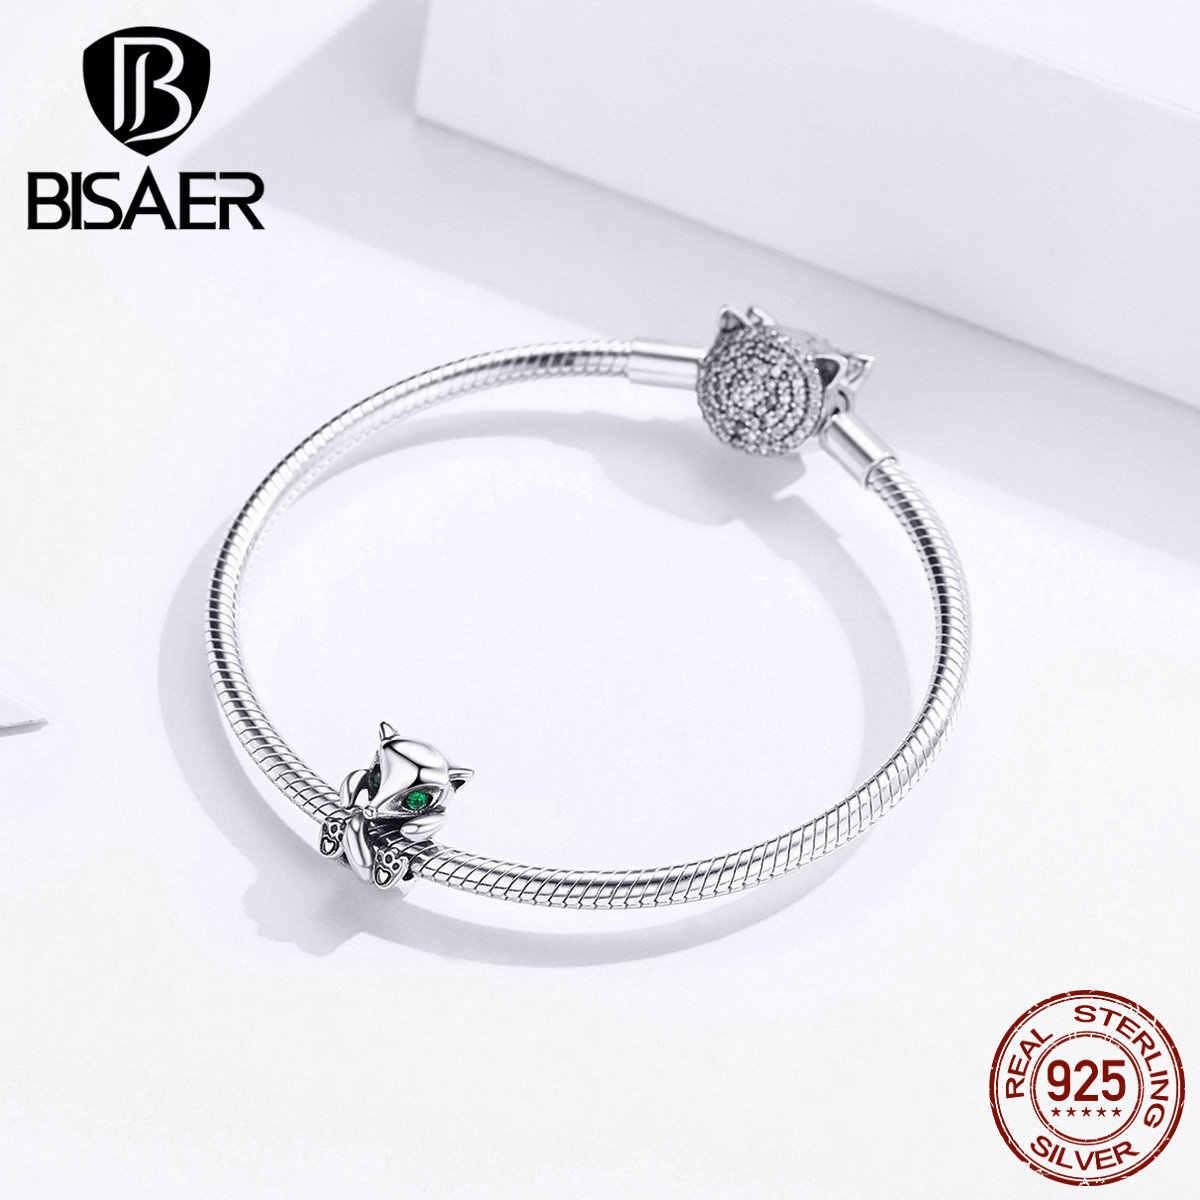 Bisaer 925 prata esterlina encantos bonito animal grânulos raposa pingente charme apto pan pulseira original para as mulheres jóias finas